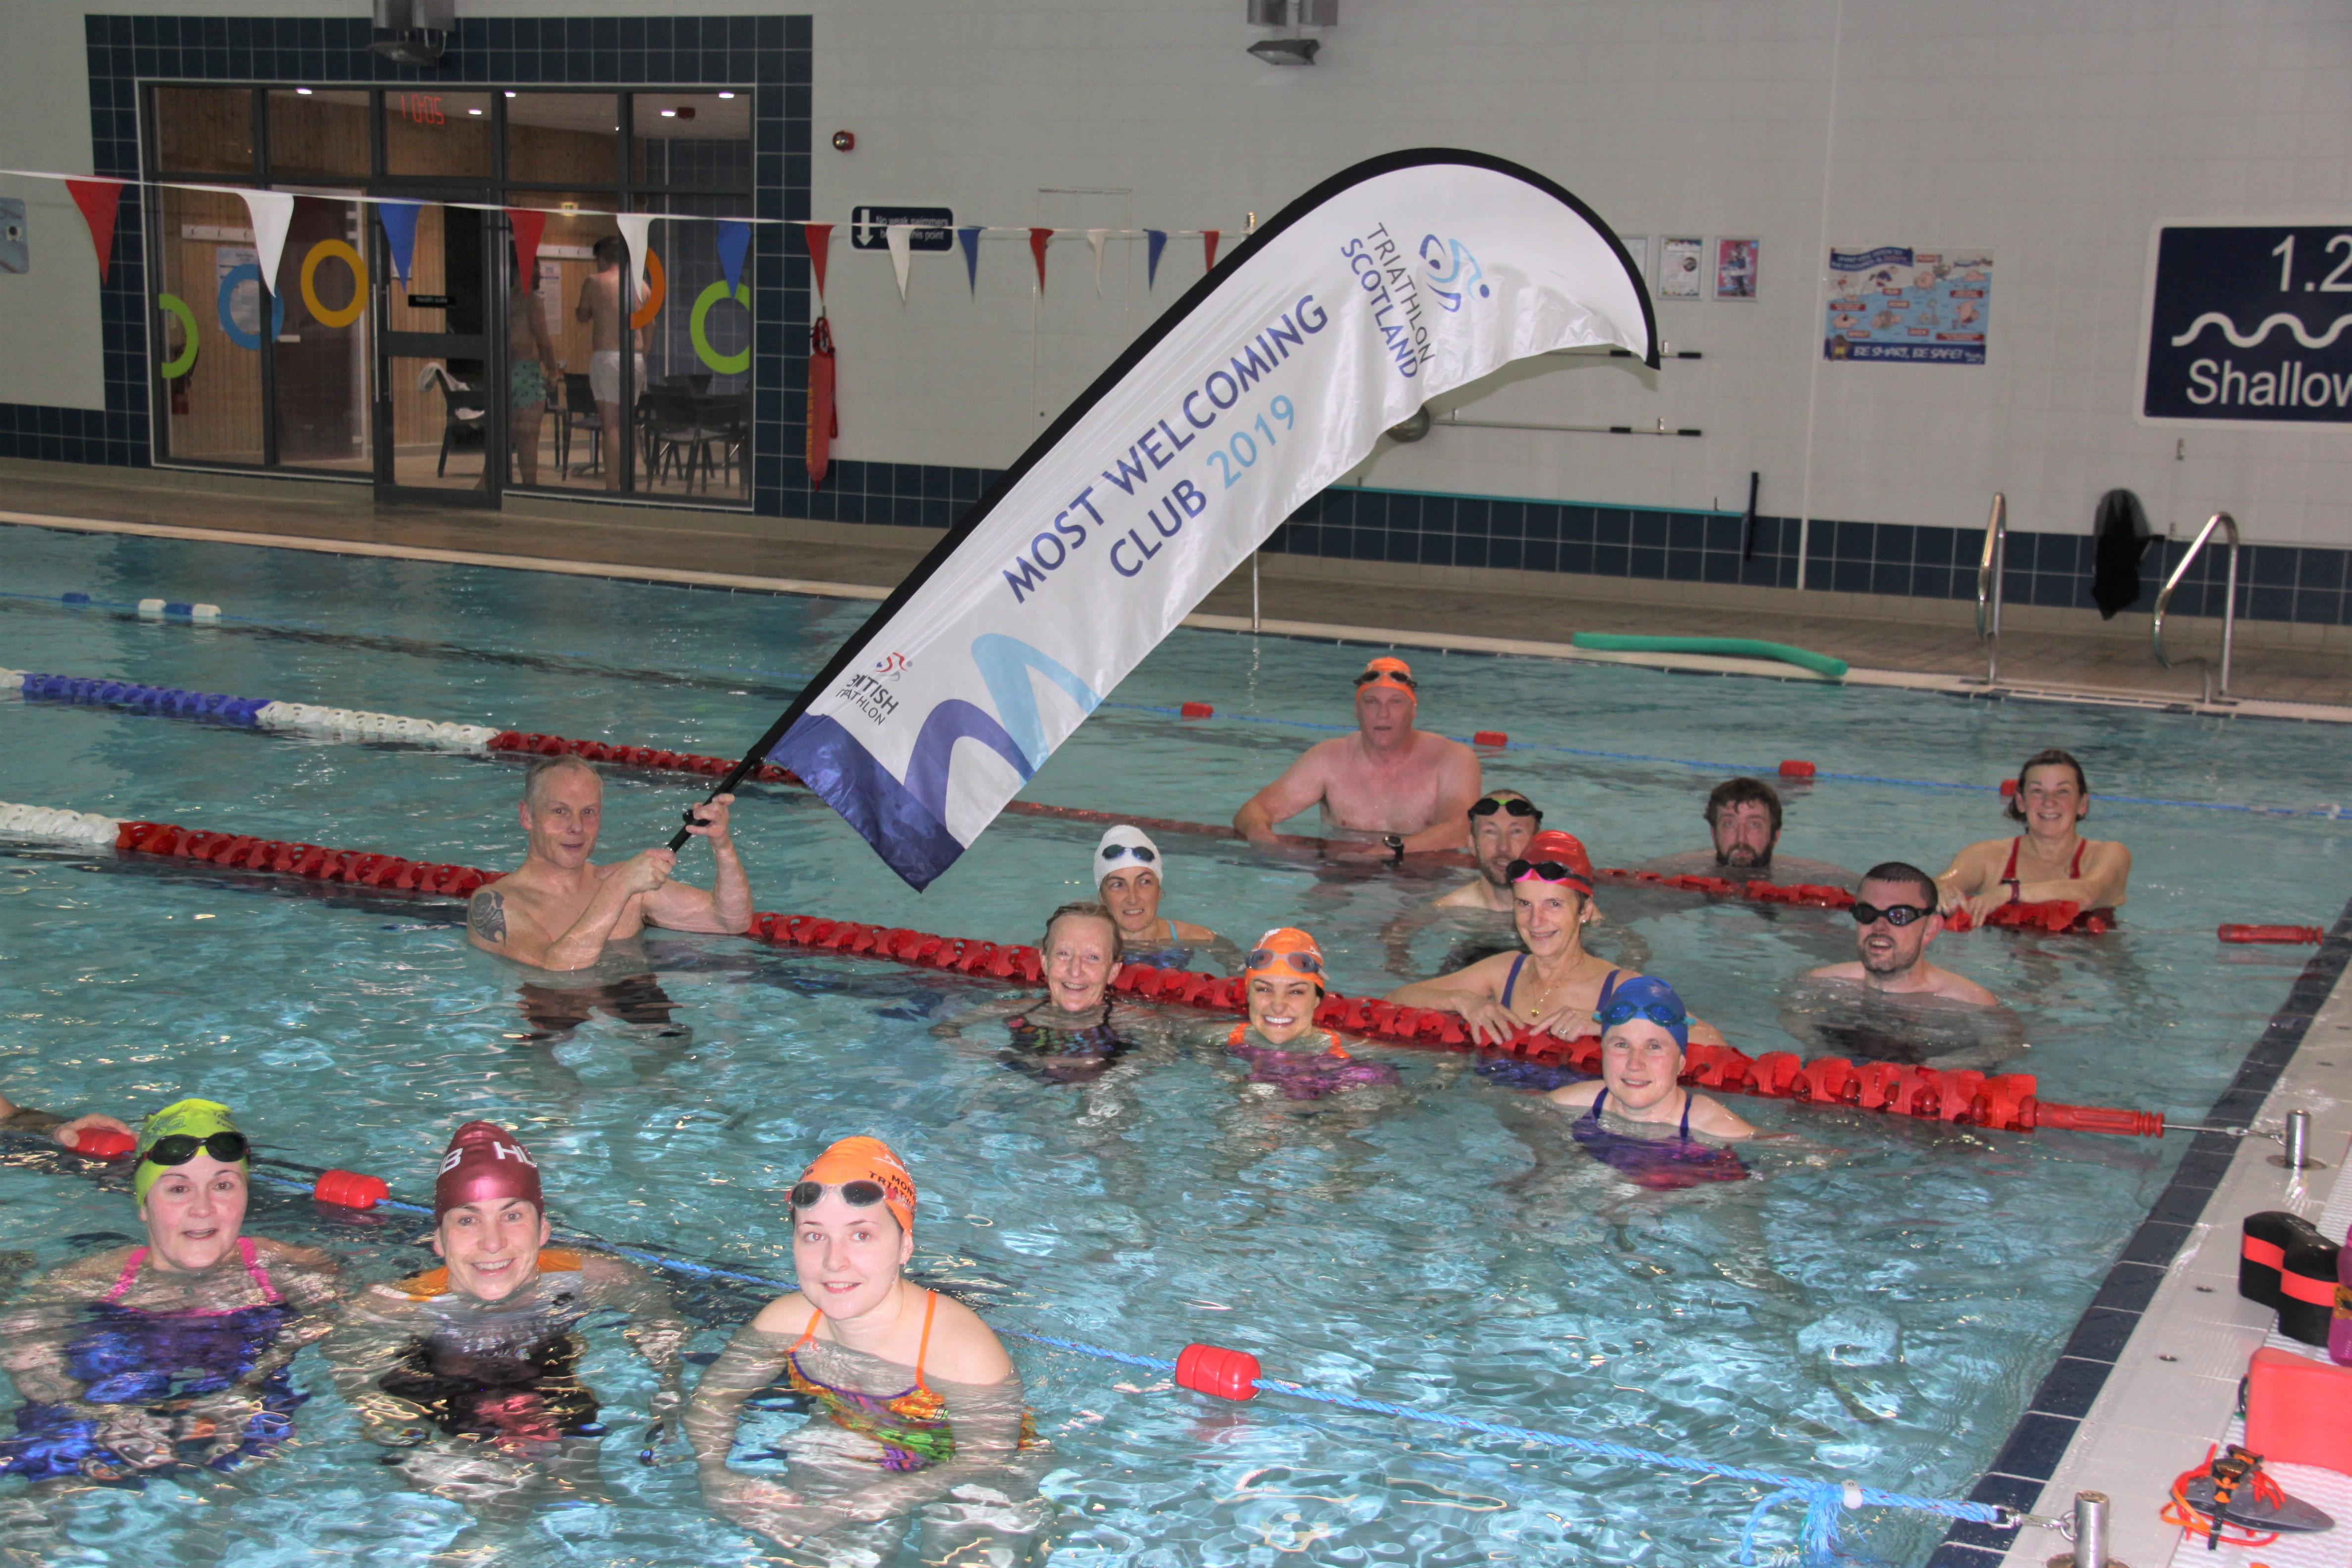 Montrose Triathlon Club celebrate success at this week's swim training session.